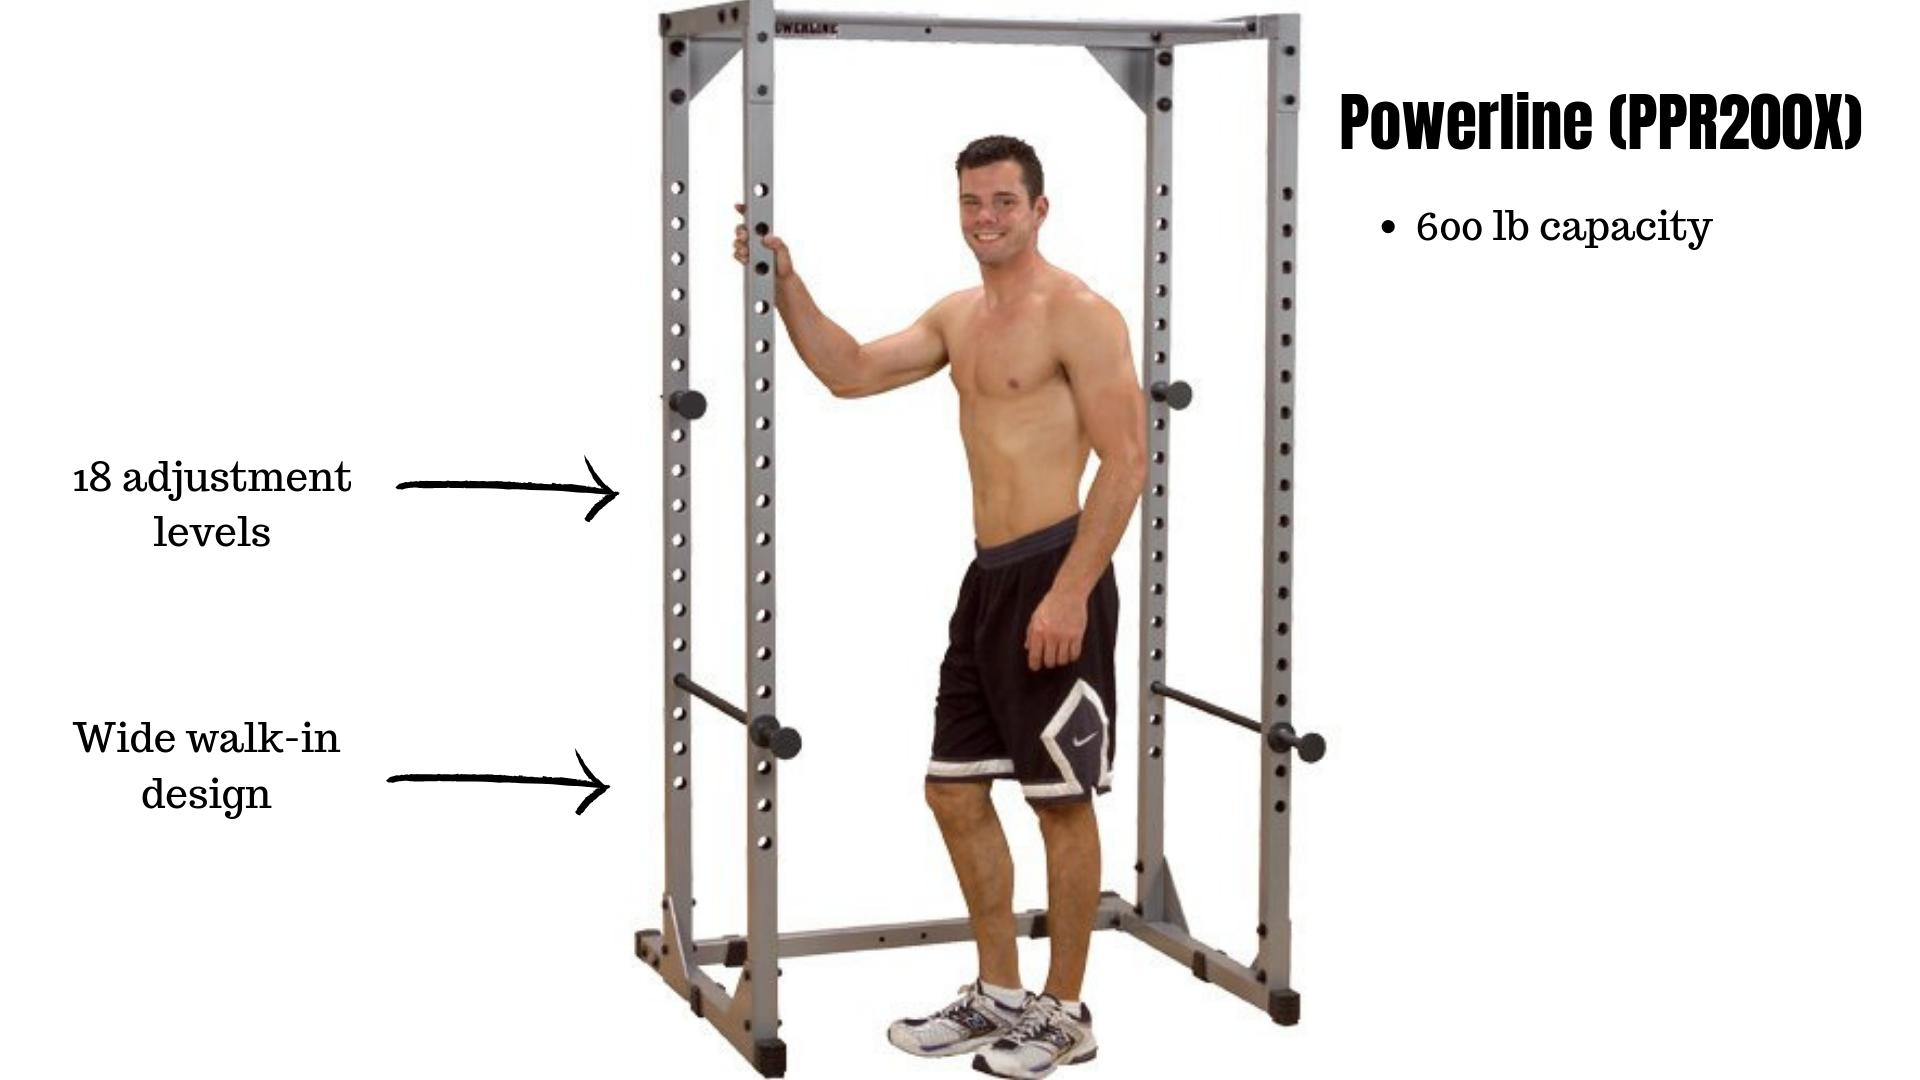 Body-Solid Powerline PPR200X